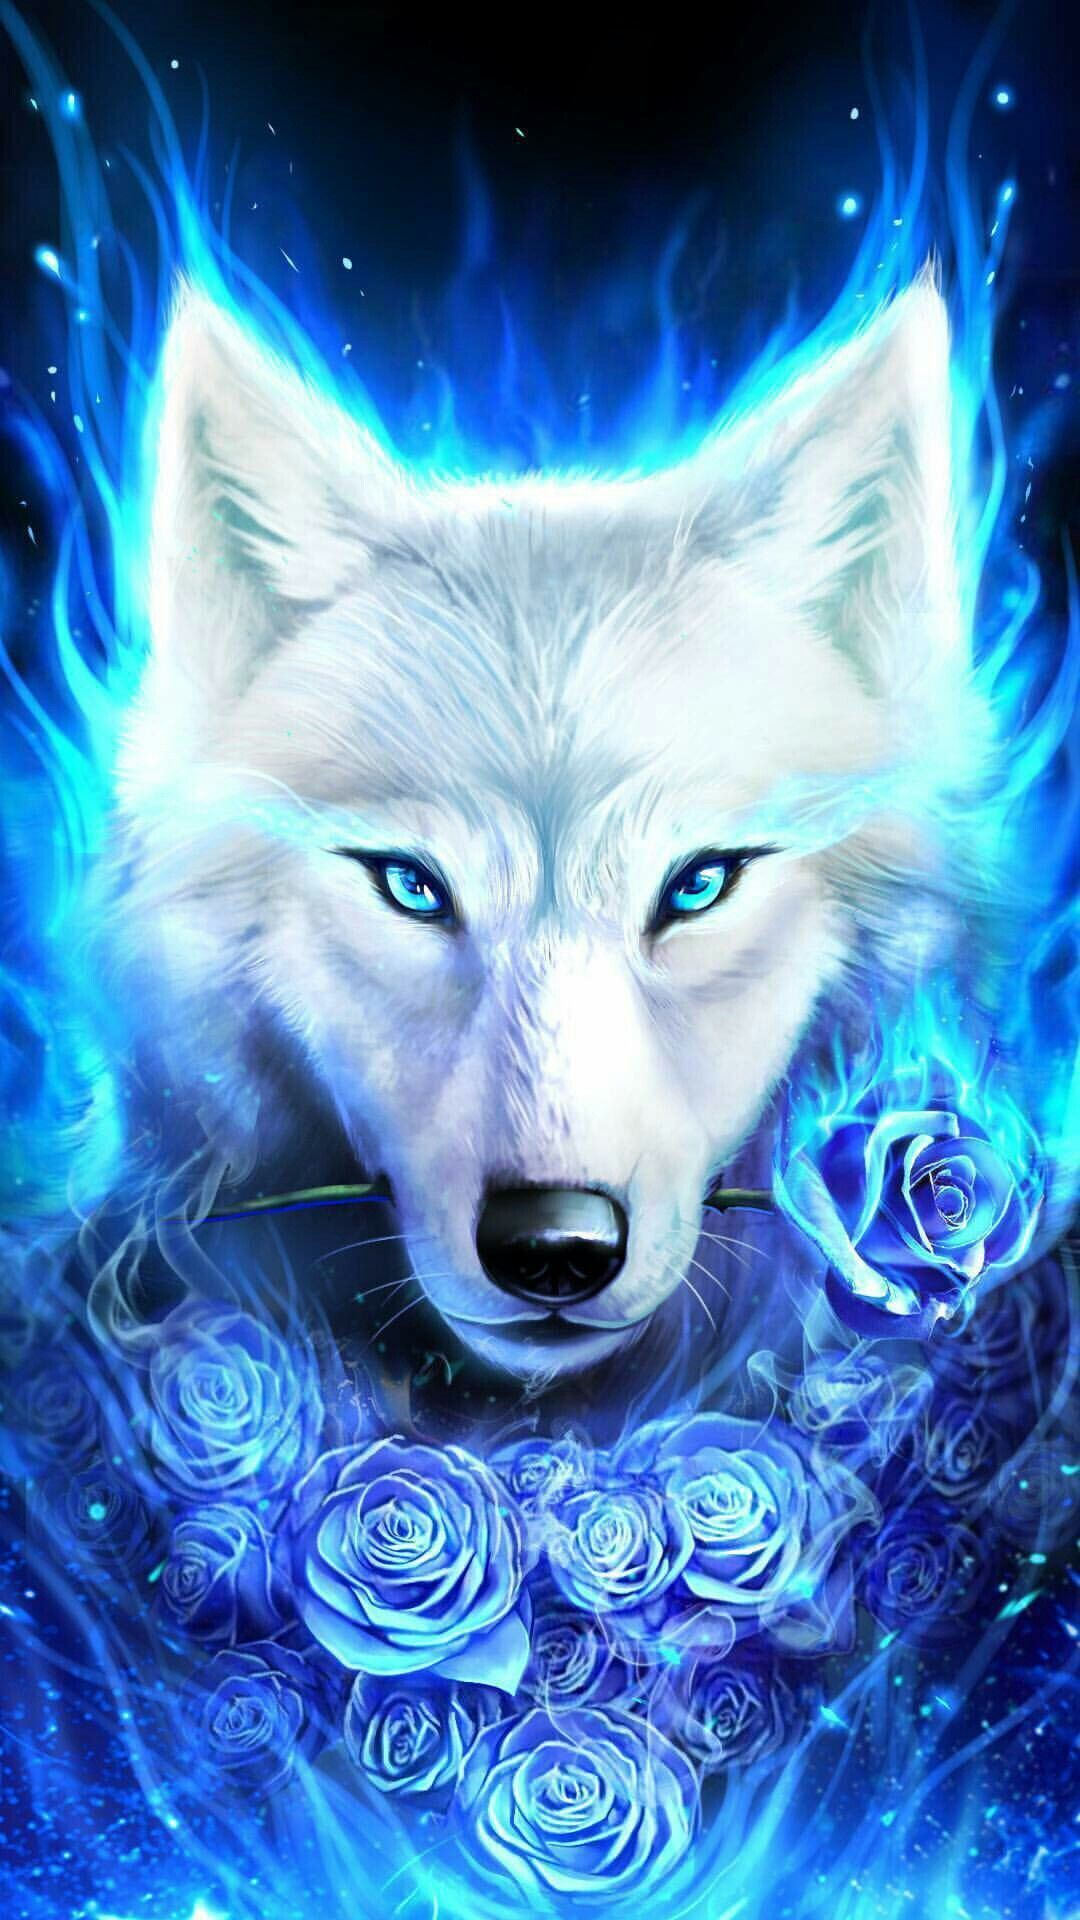 Cute Galaxy Wolf Wallpapers , Top Free Cute Galaxy Wolf